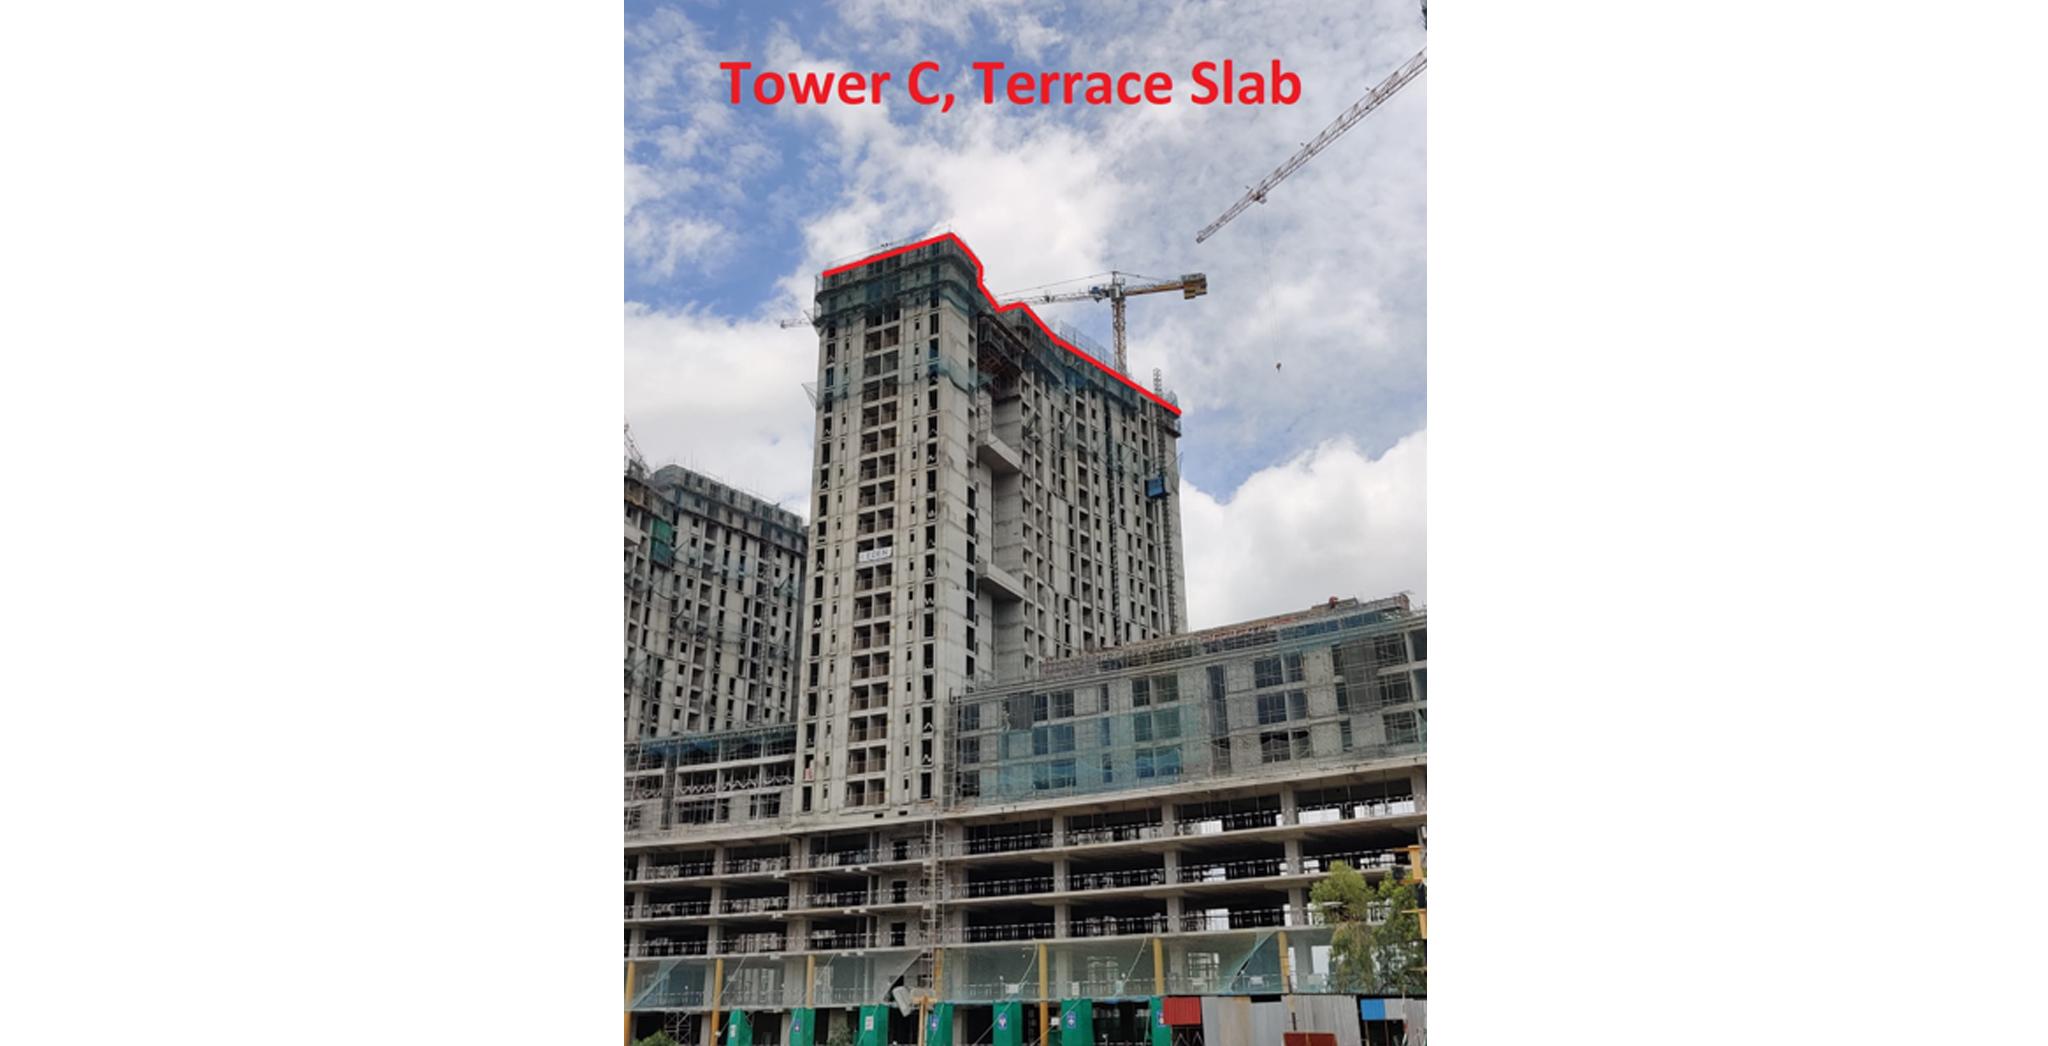 Sep 2021 - Eden Tower C: Completion of Terrace floor slab Milestone